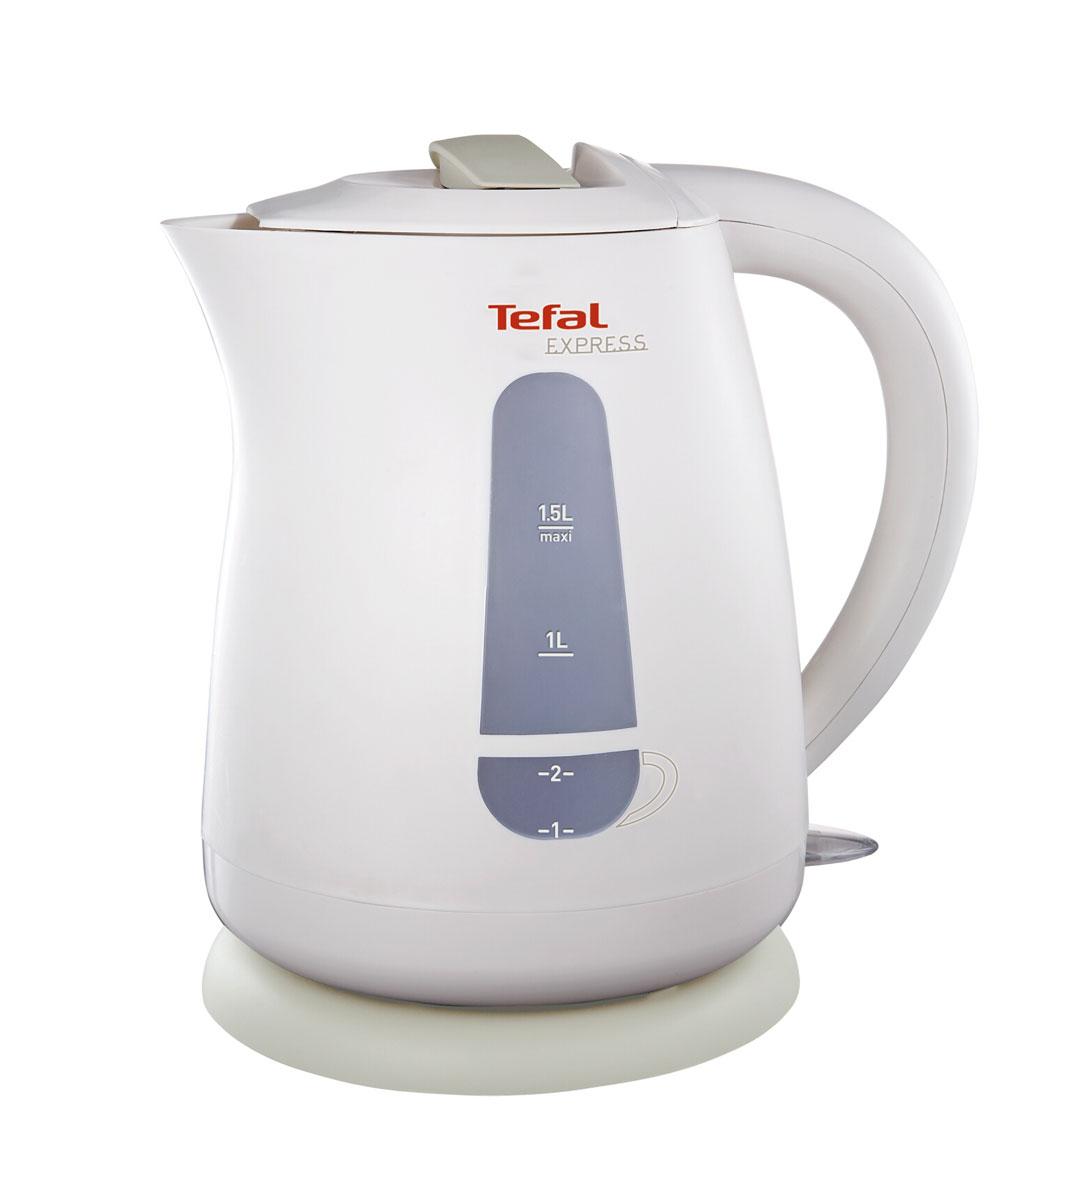 Tefal KO29913E Express Plastic электрический чайник чайник tefal ko299 white ko29913e